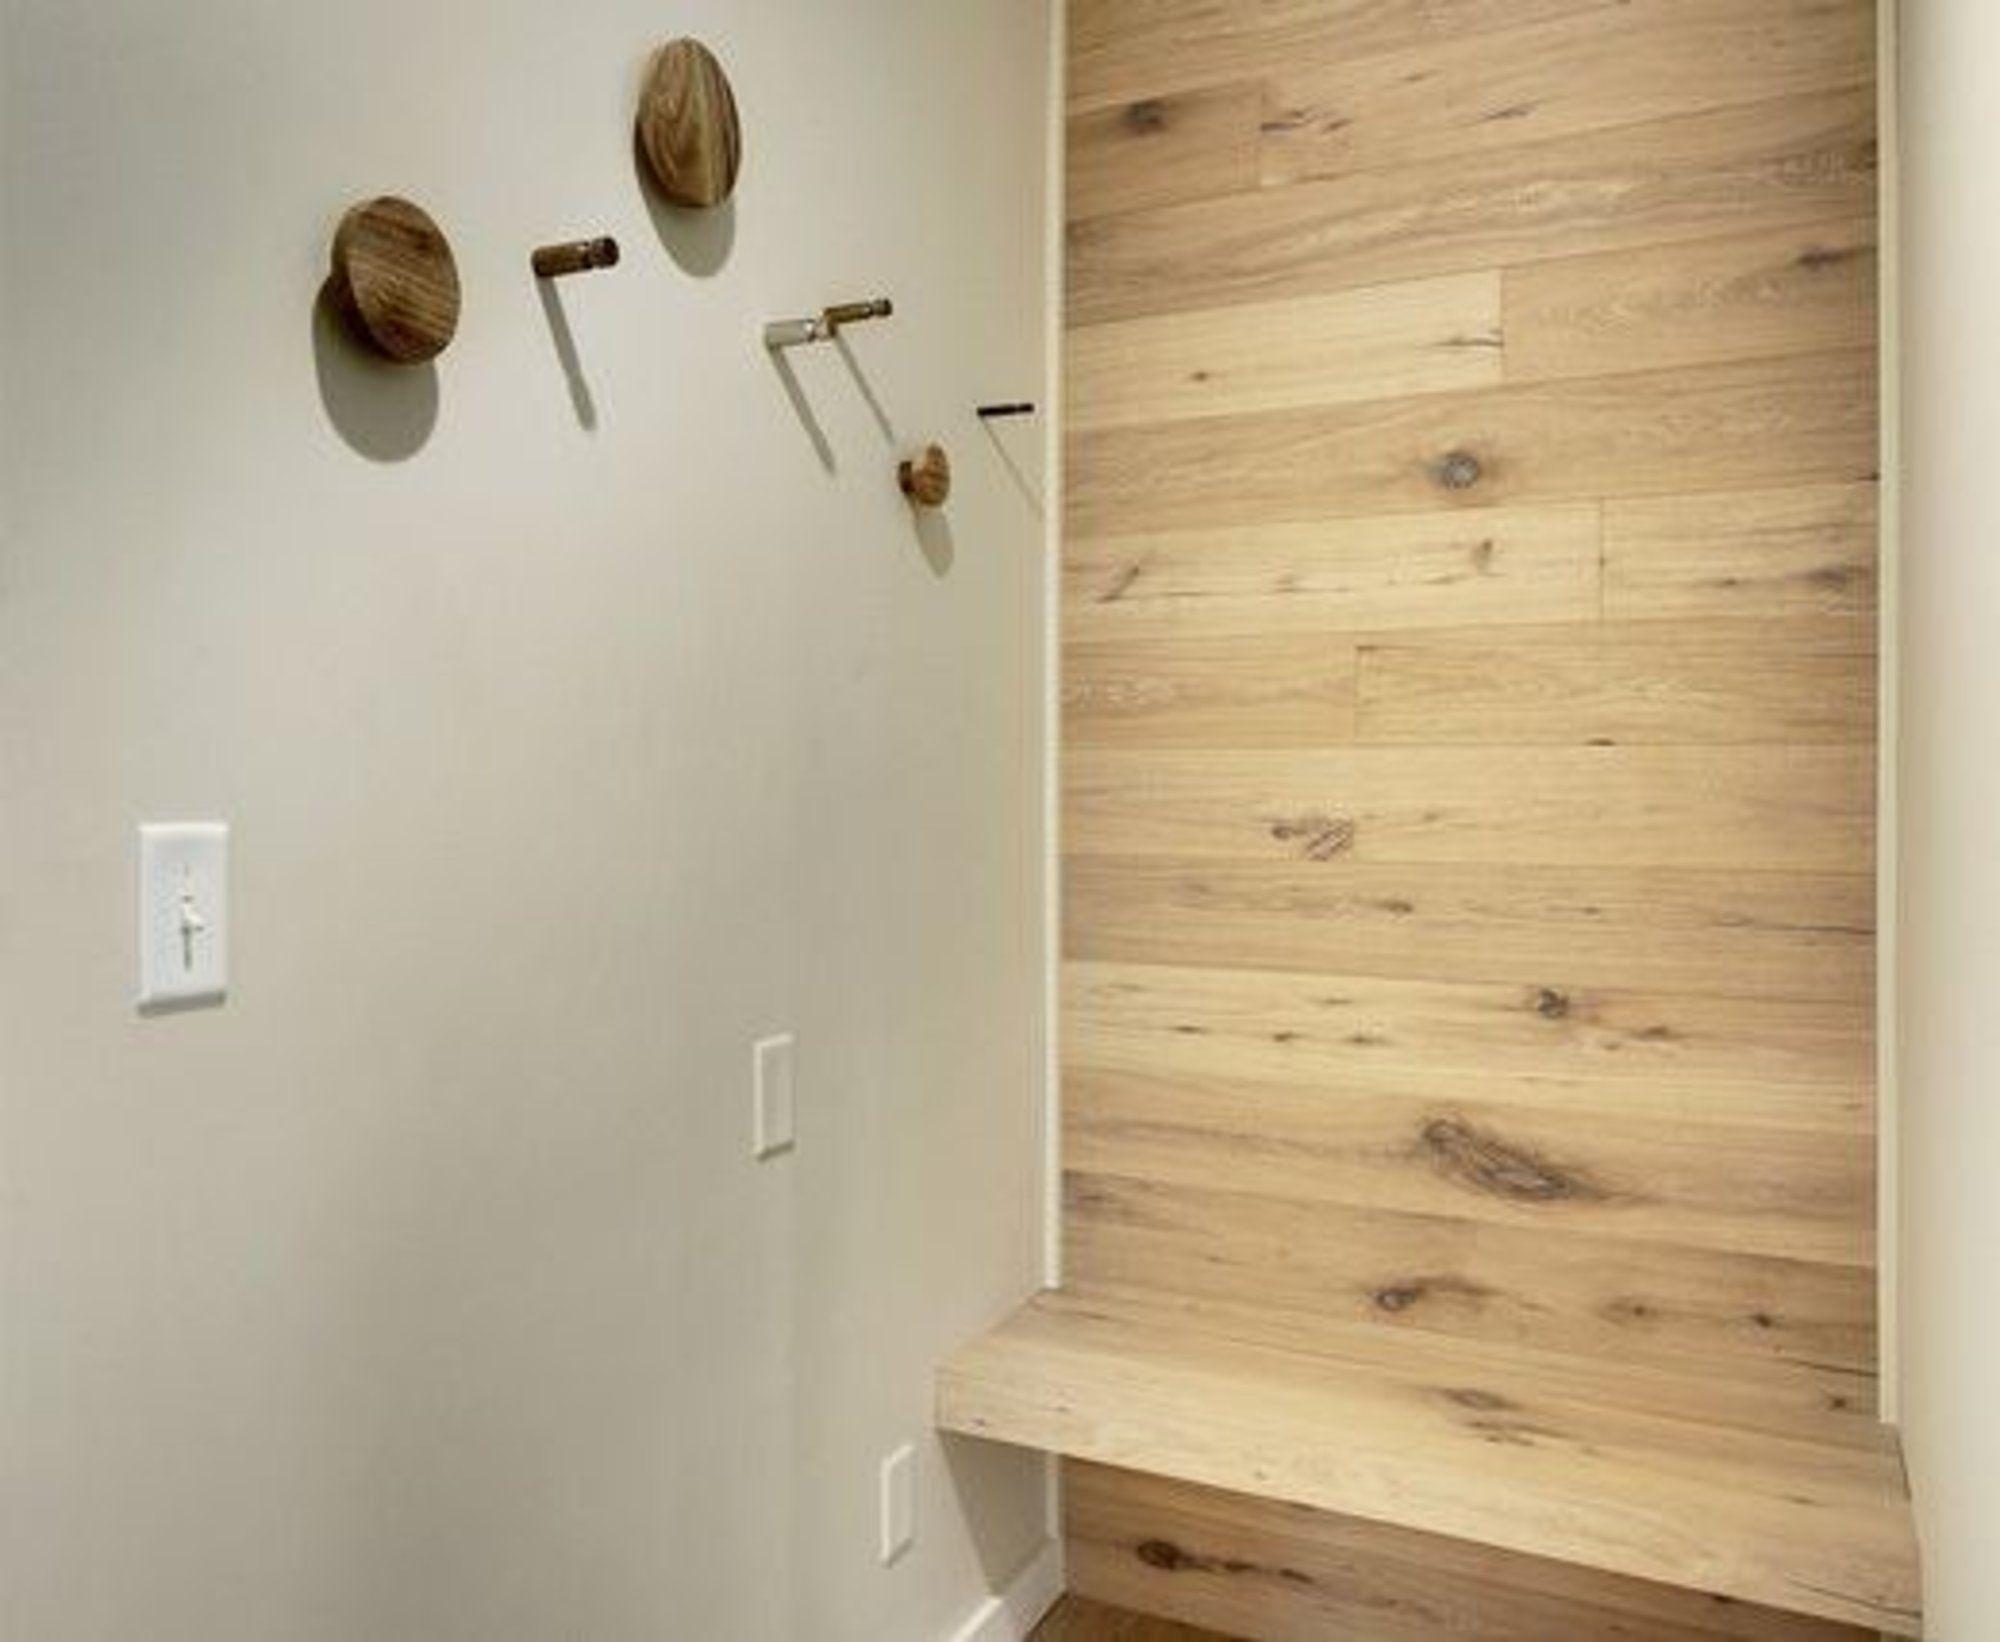 coat hooks as sculptural artwork. form + function! | Happy House ...